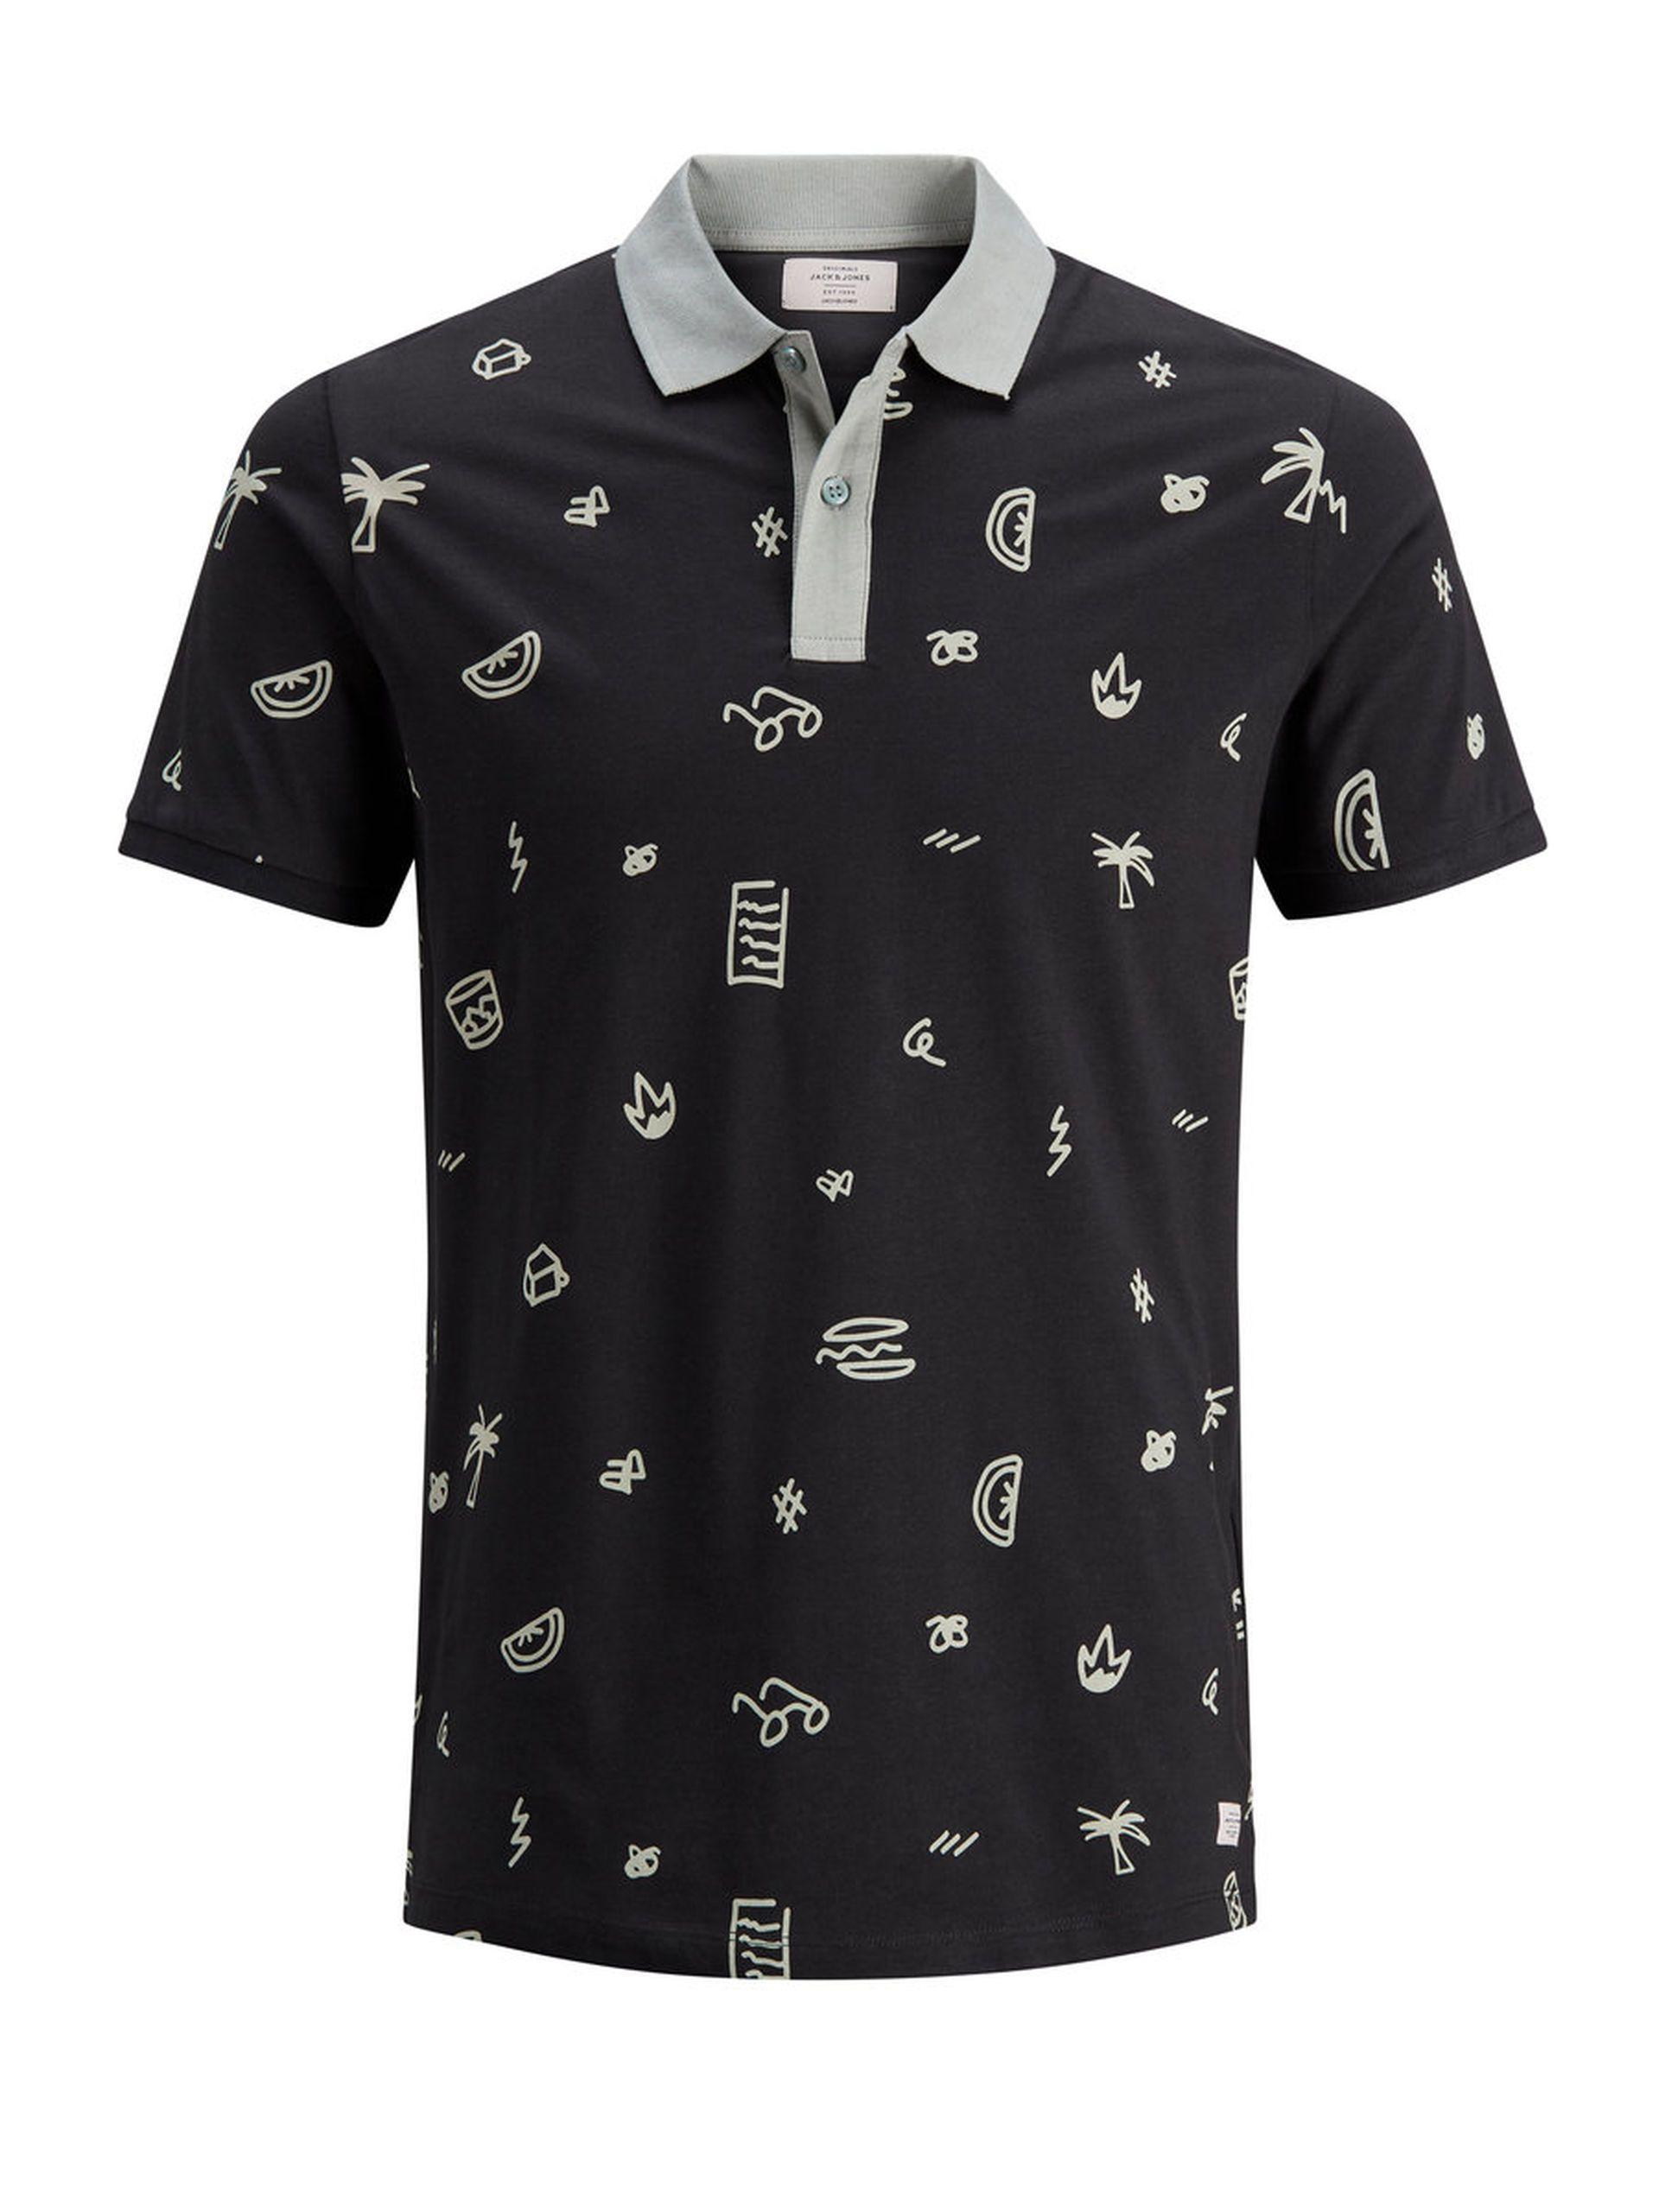 Printed Polo Shirt Jack Jones Clothes Pinterest Printed